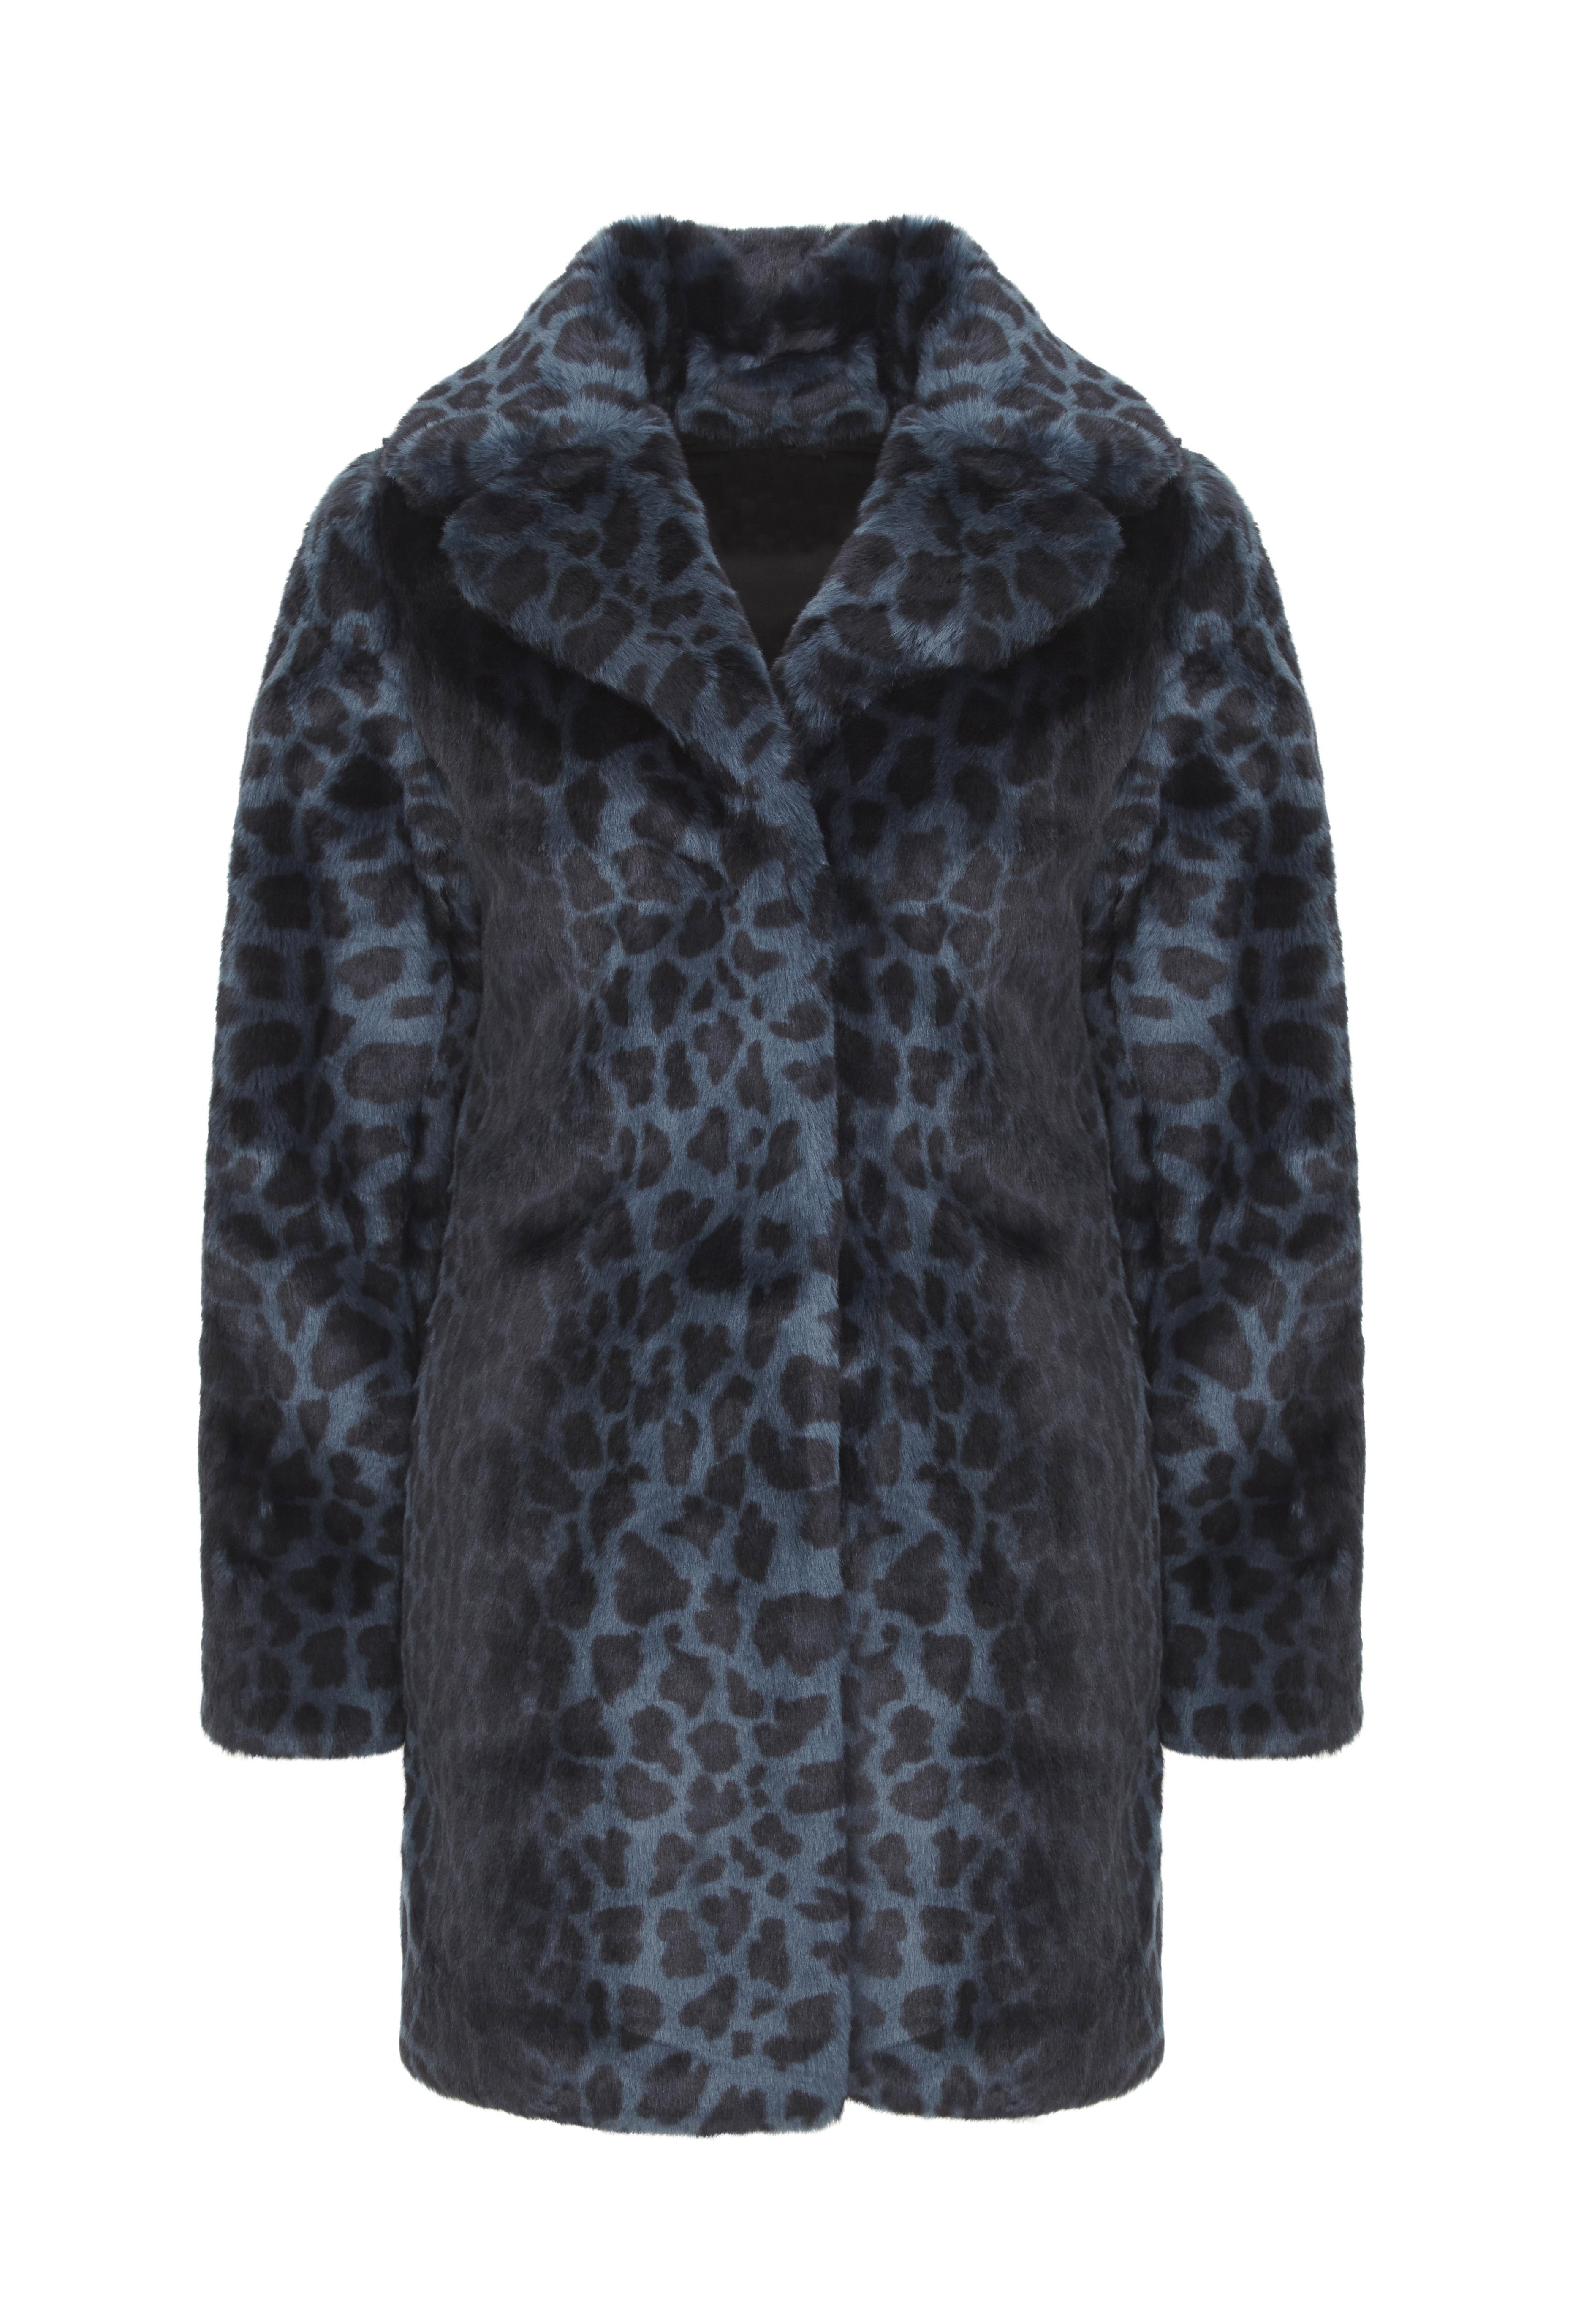 Blue Leopard Coat -ú99.99